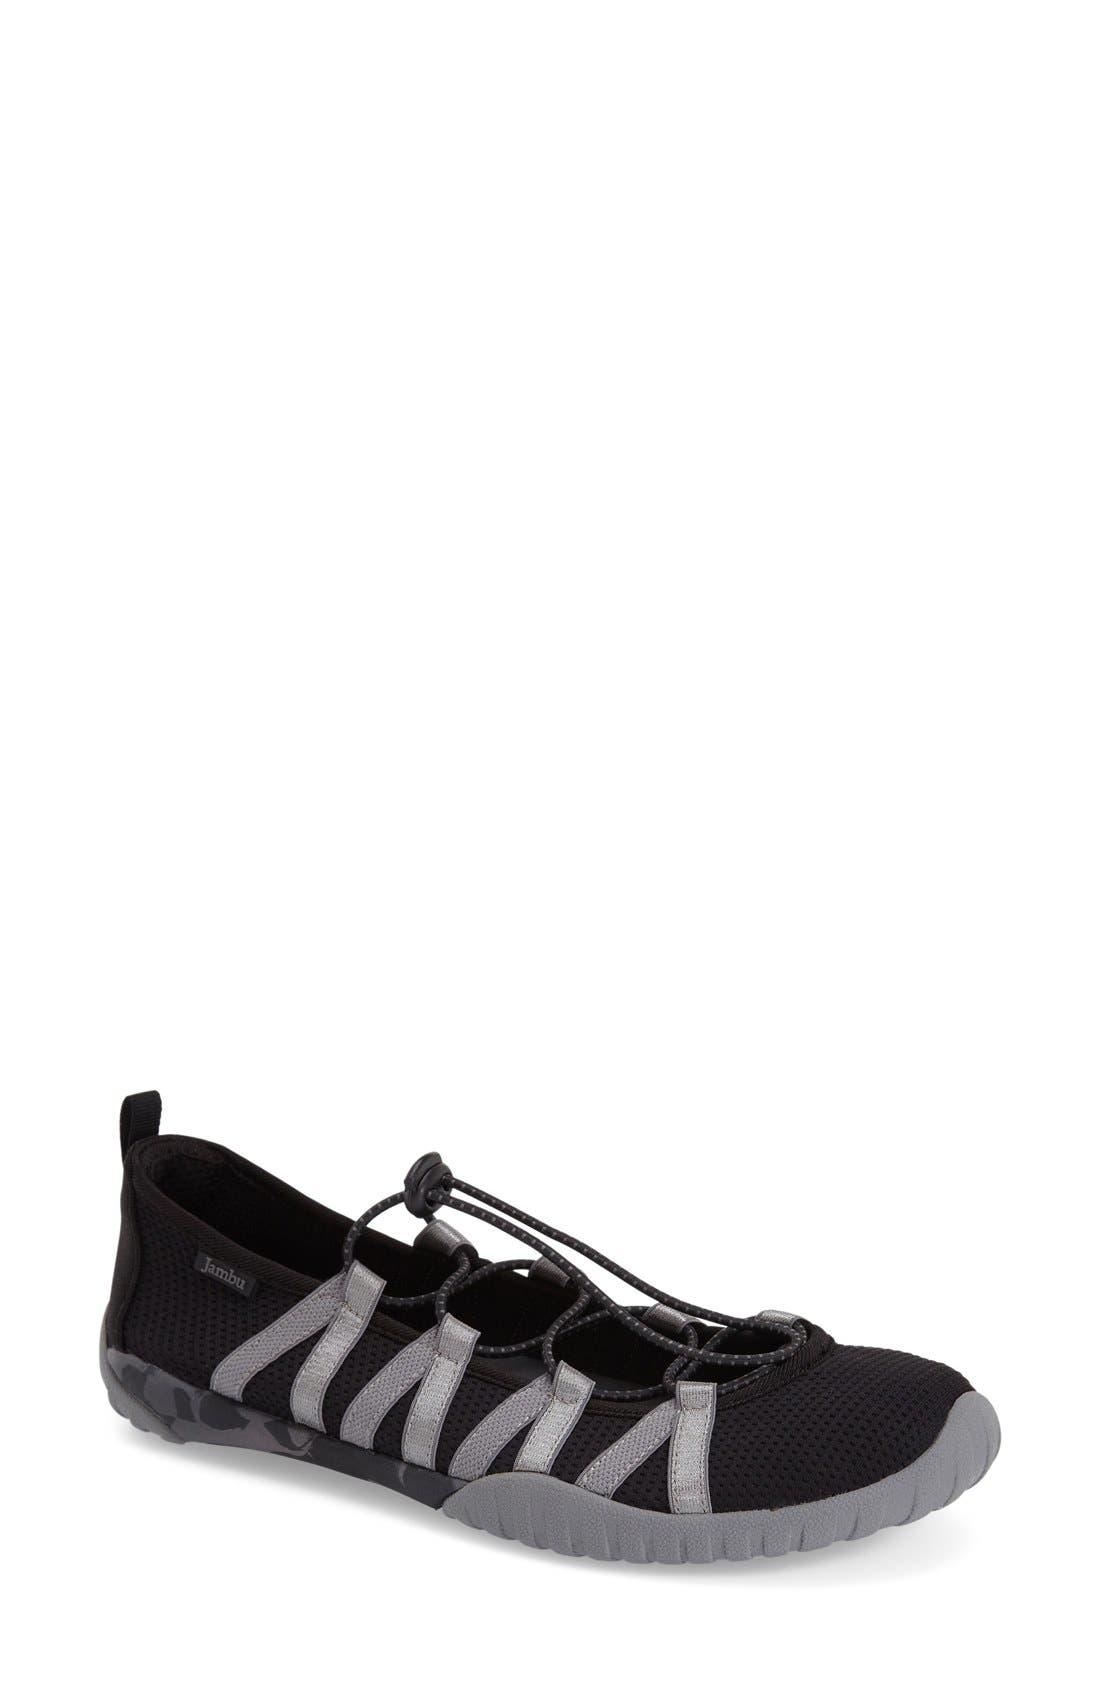 'Manuka' Water Friendly Slip-On Sneaker,                             Main thumbnail 1, color,                             Black Fabric